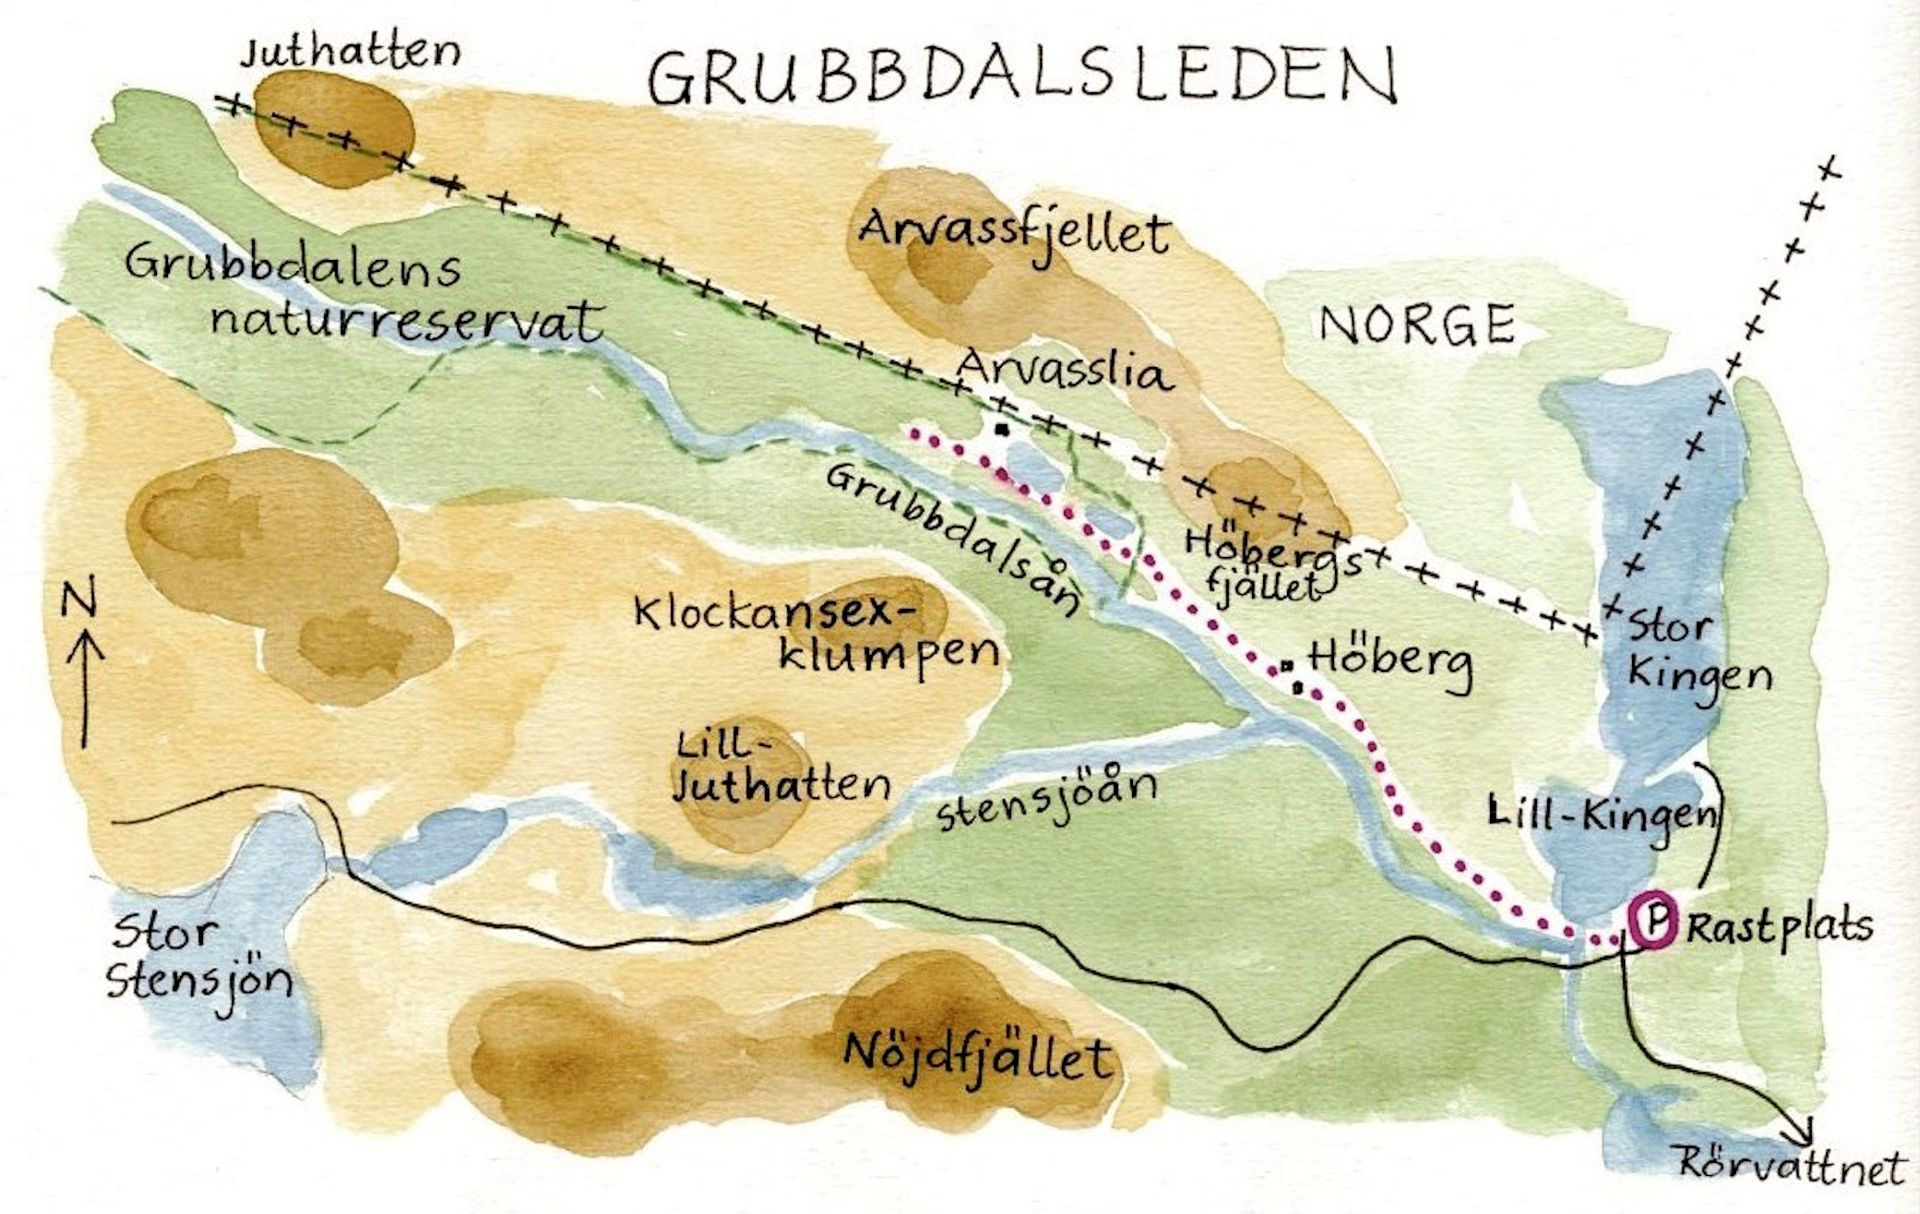 Grubbdalsleden ledkarta. Illustration Rut Magnusson.